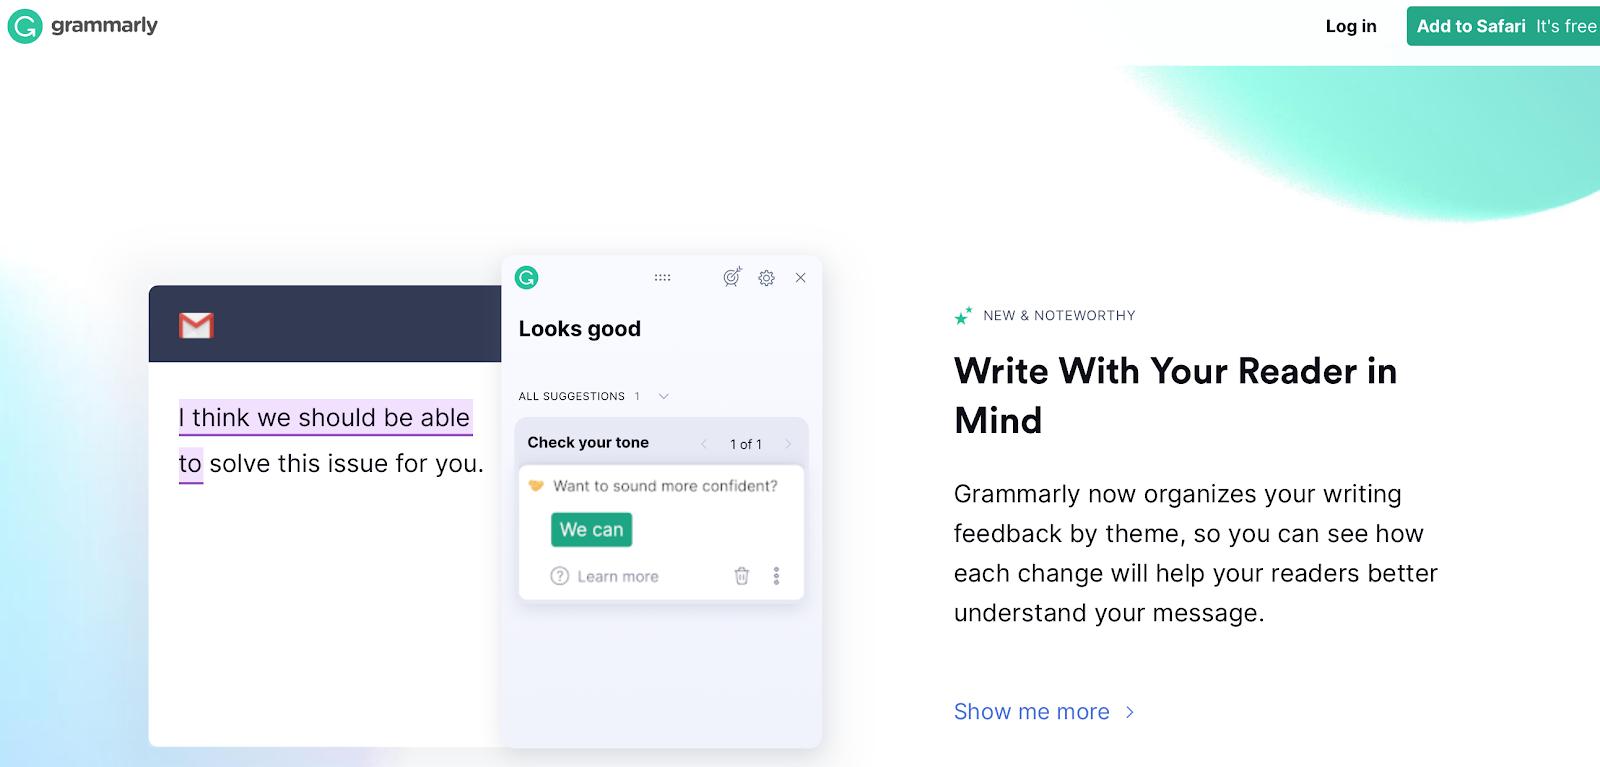 omniscient digital best content marketing tools grammarly